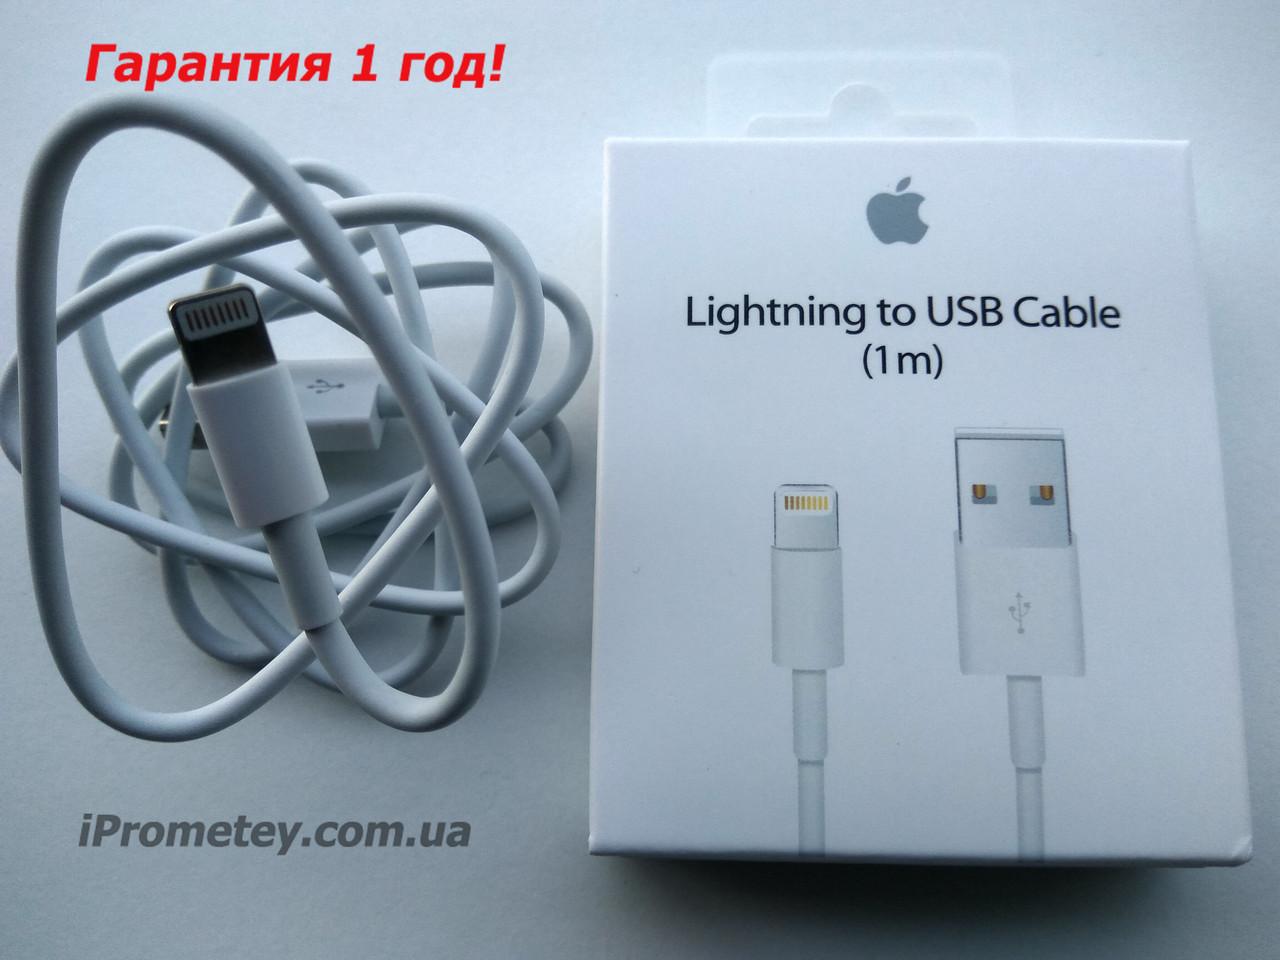 Кабель Apple Lightning USB ГАРАНТИЯ 1ГОД! для зарядки iPhone5 6s 7Plus8X10XR XS Max 11Pro Айфон iPad MD818ZM/А